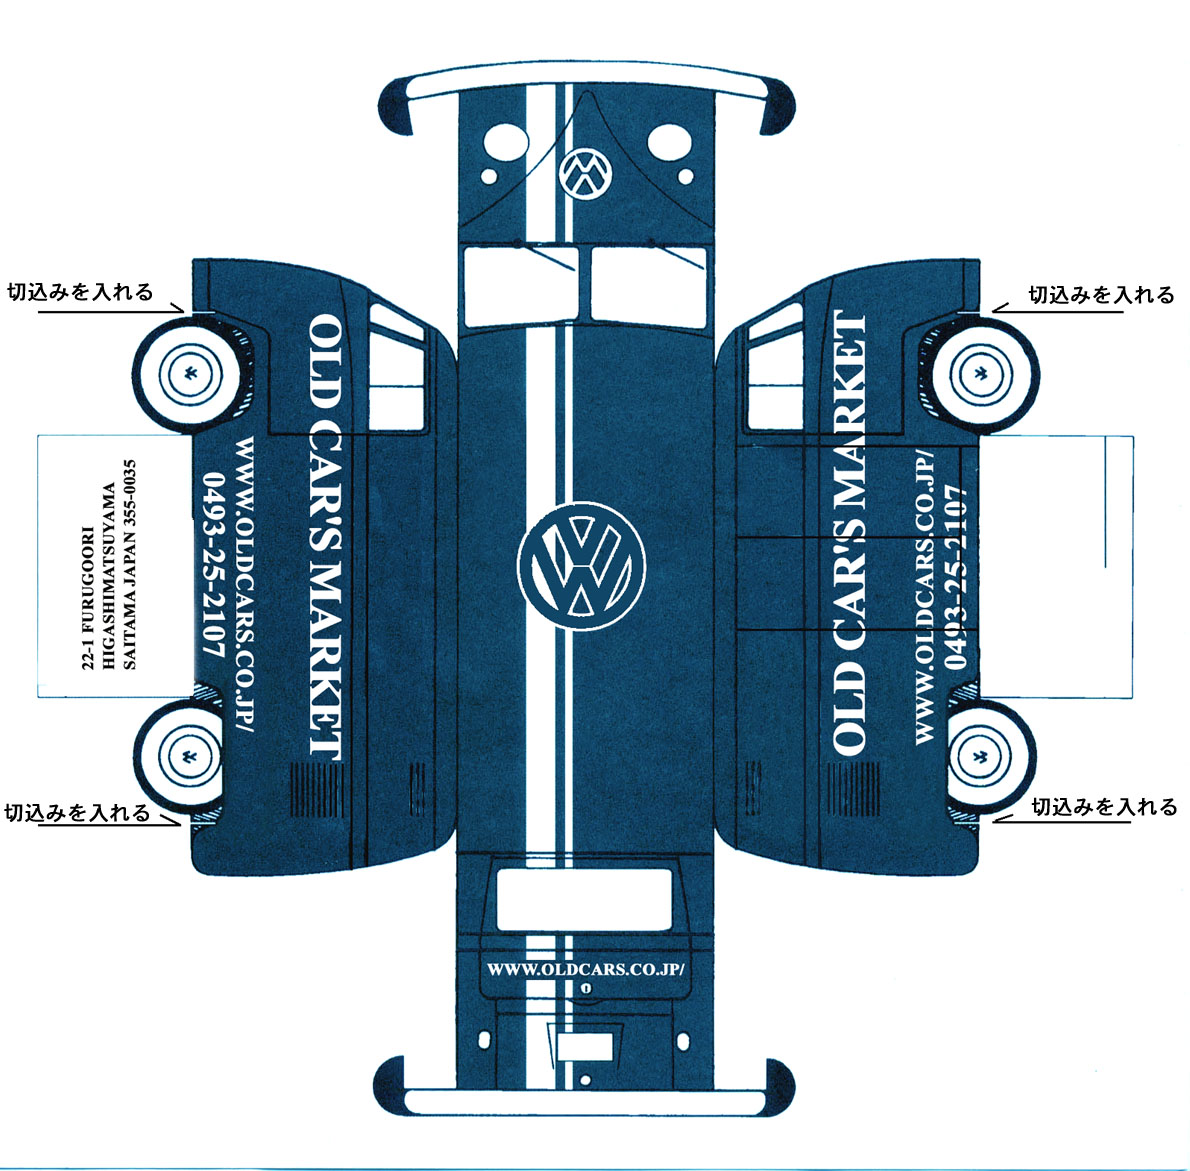 Connecticut Volkswagen Association